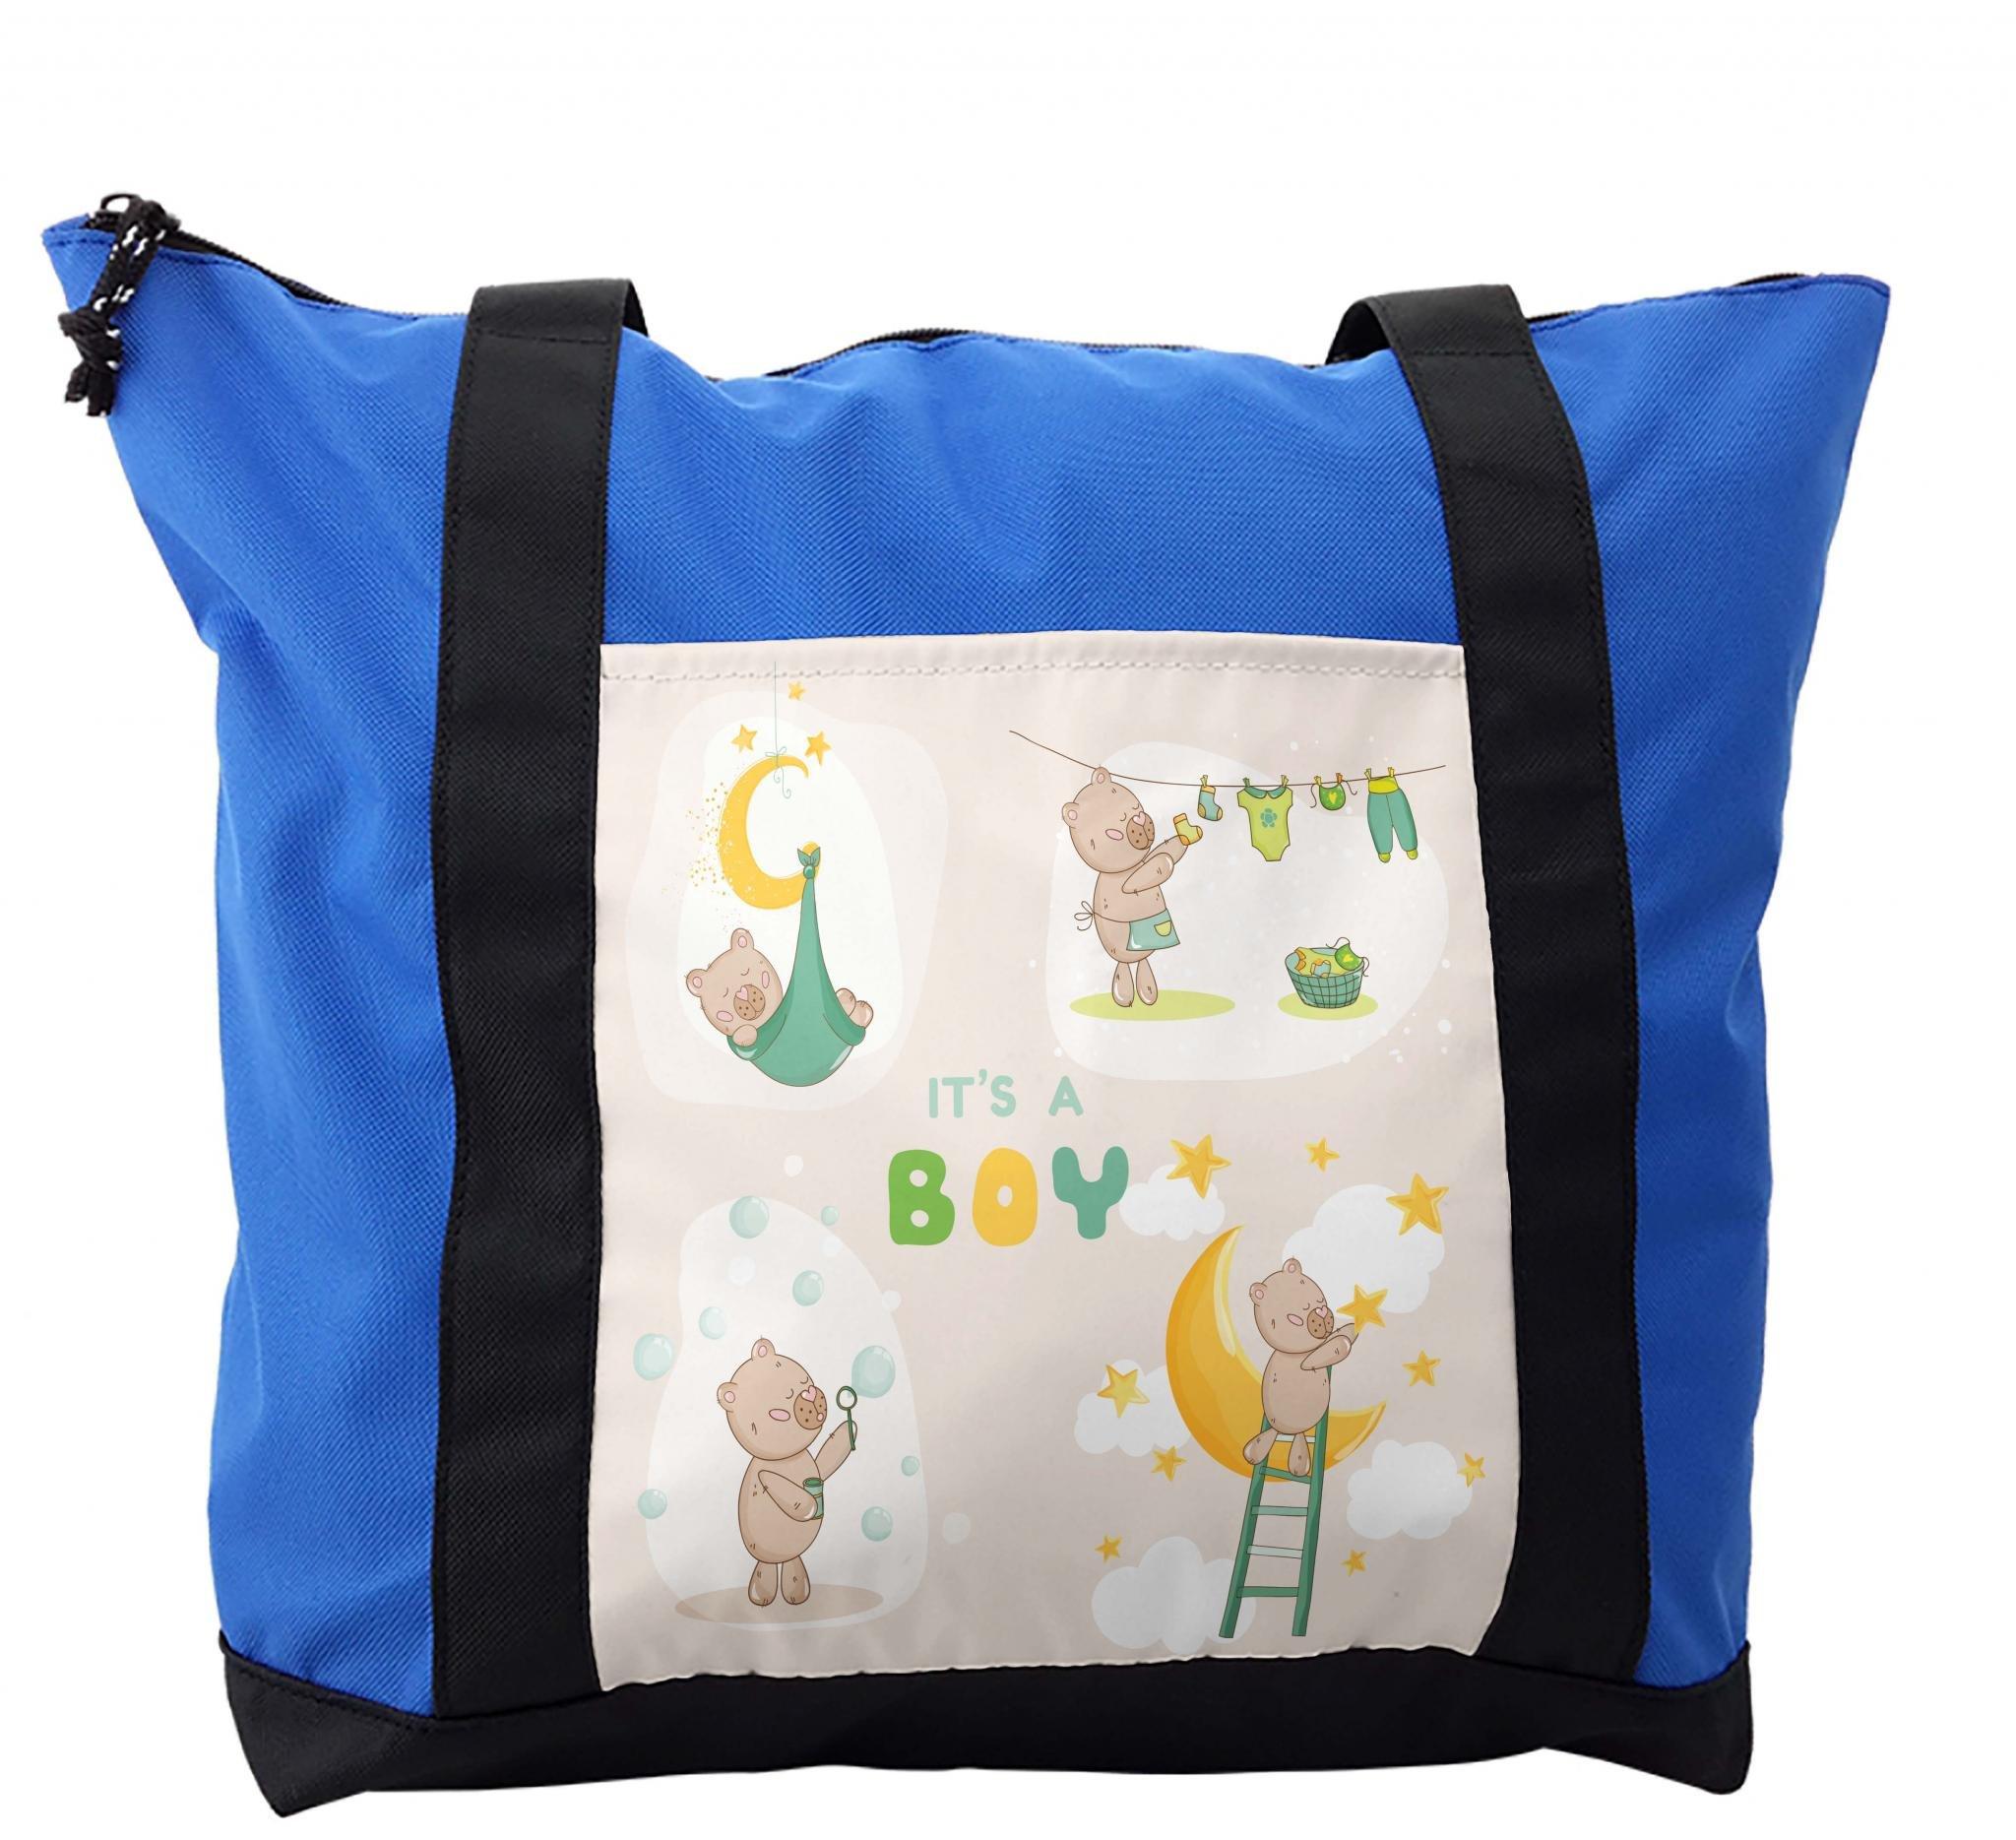 Lunarable Baby Shower Shoulder Bag, It's a Boy Teddy Bear, Durable with Zipper